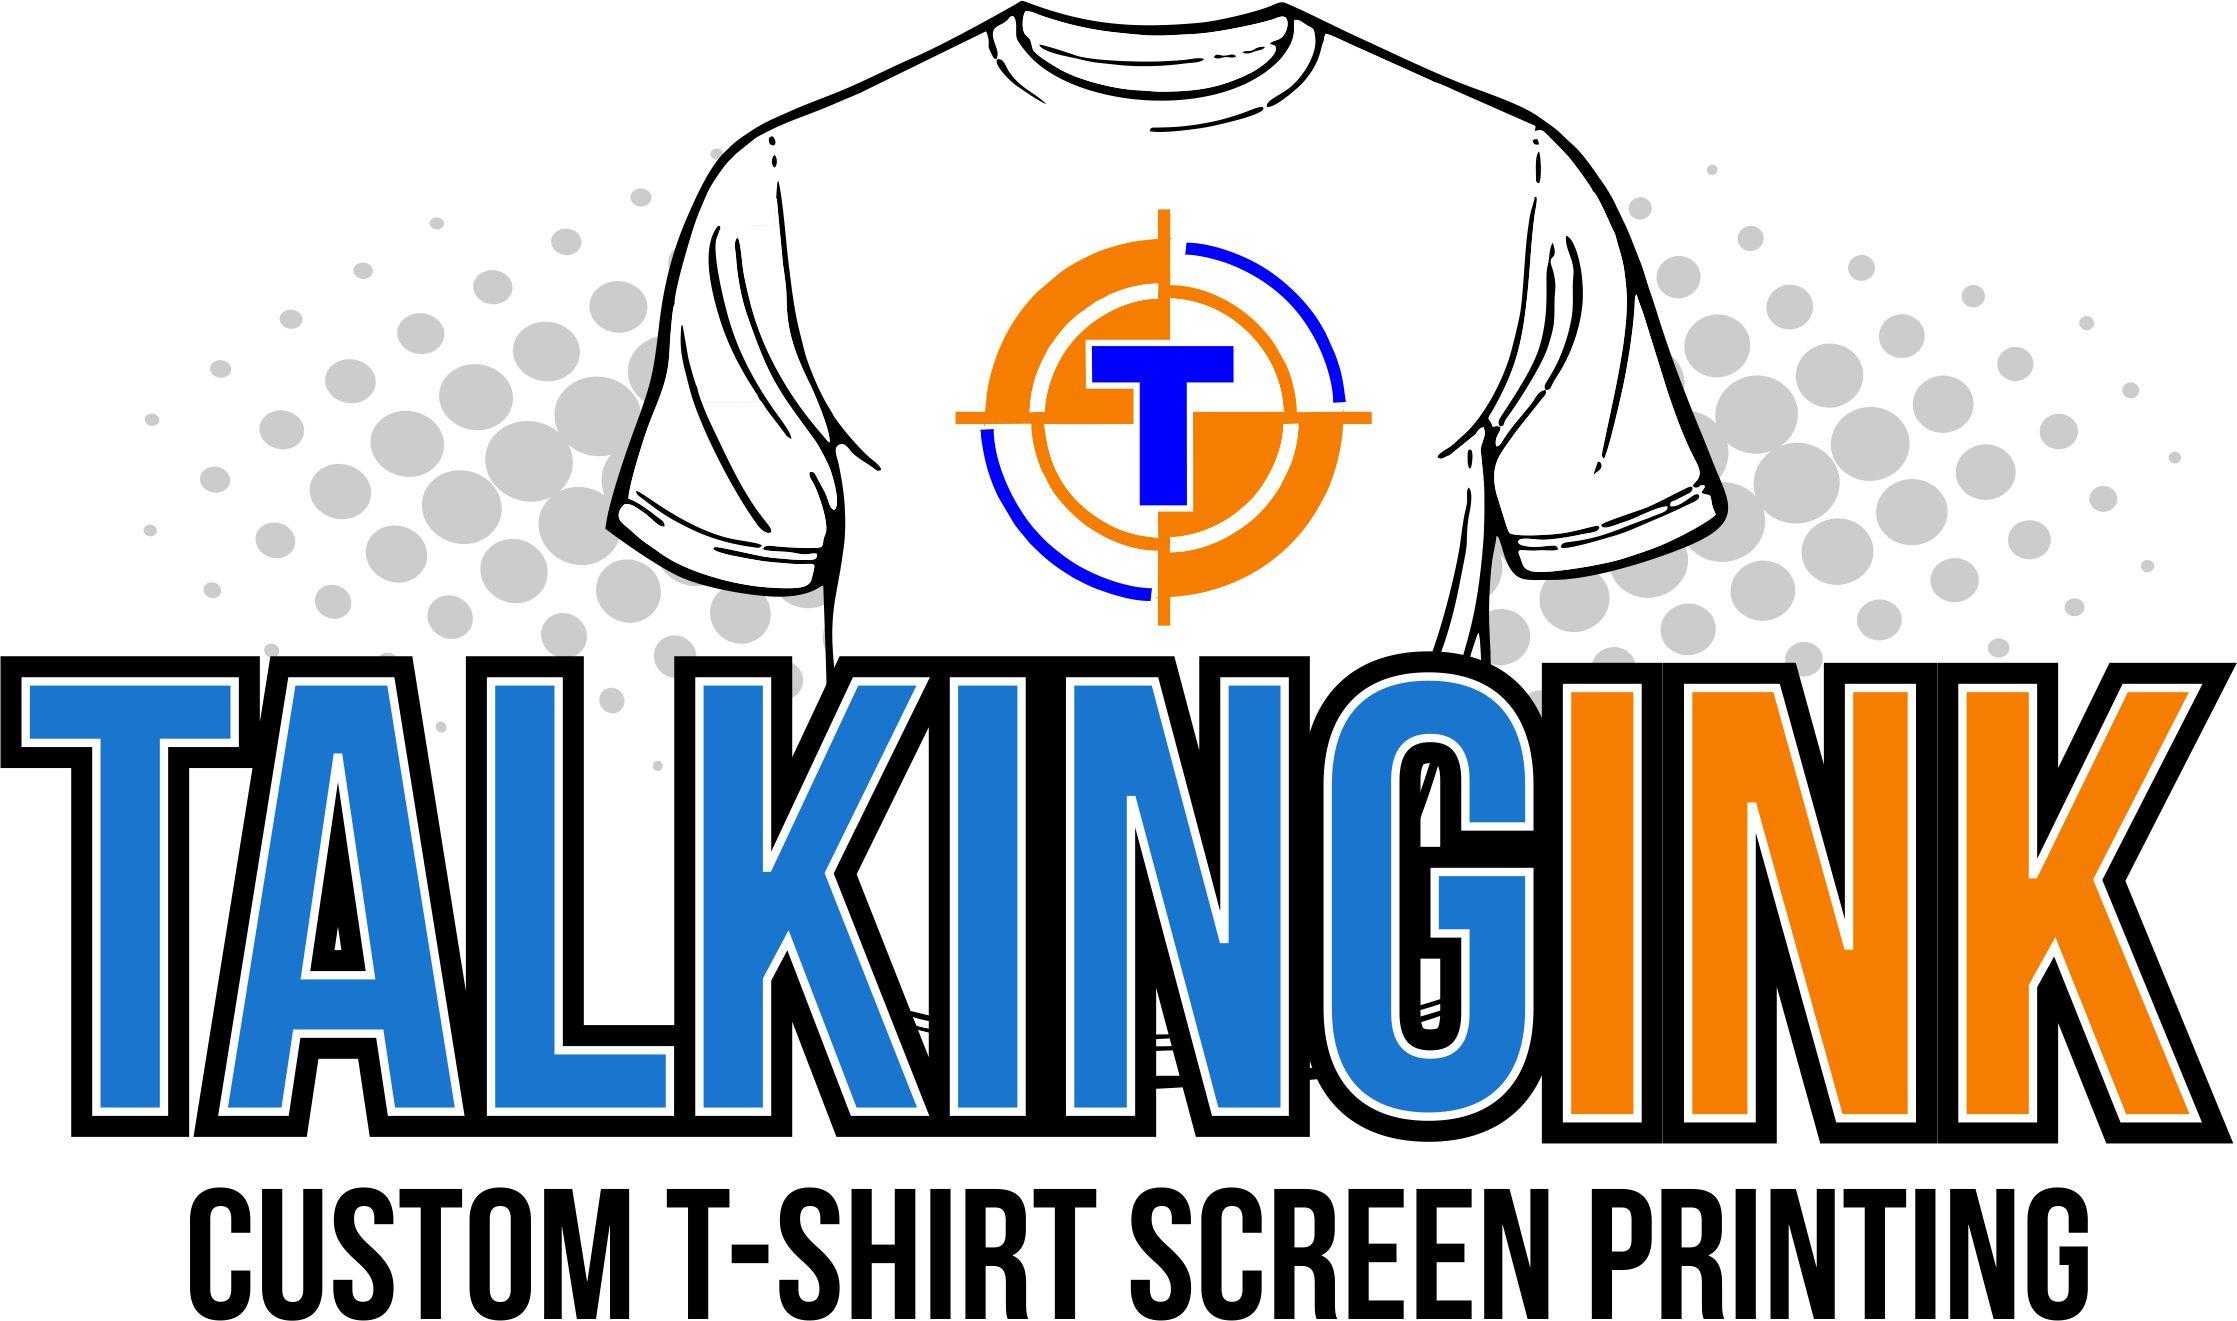 Custom t shirt screen printing saint louis talkingink for St louis t shirt printing